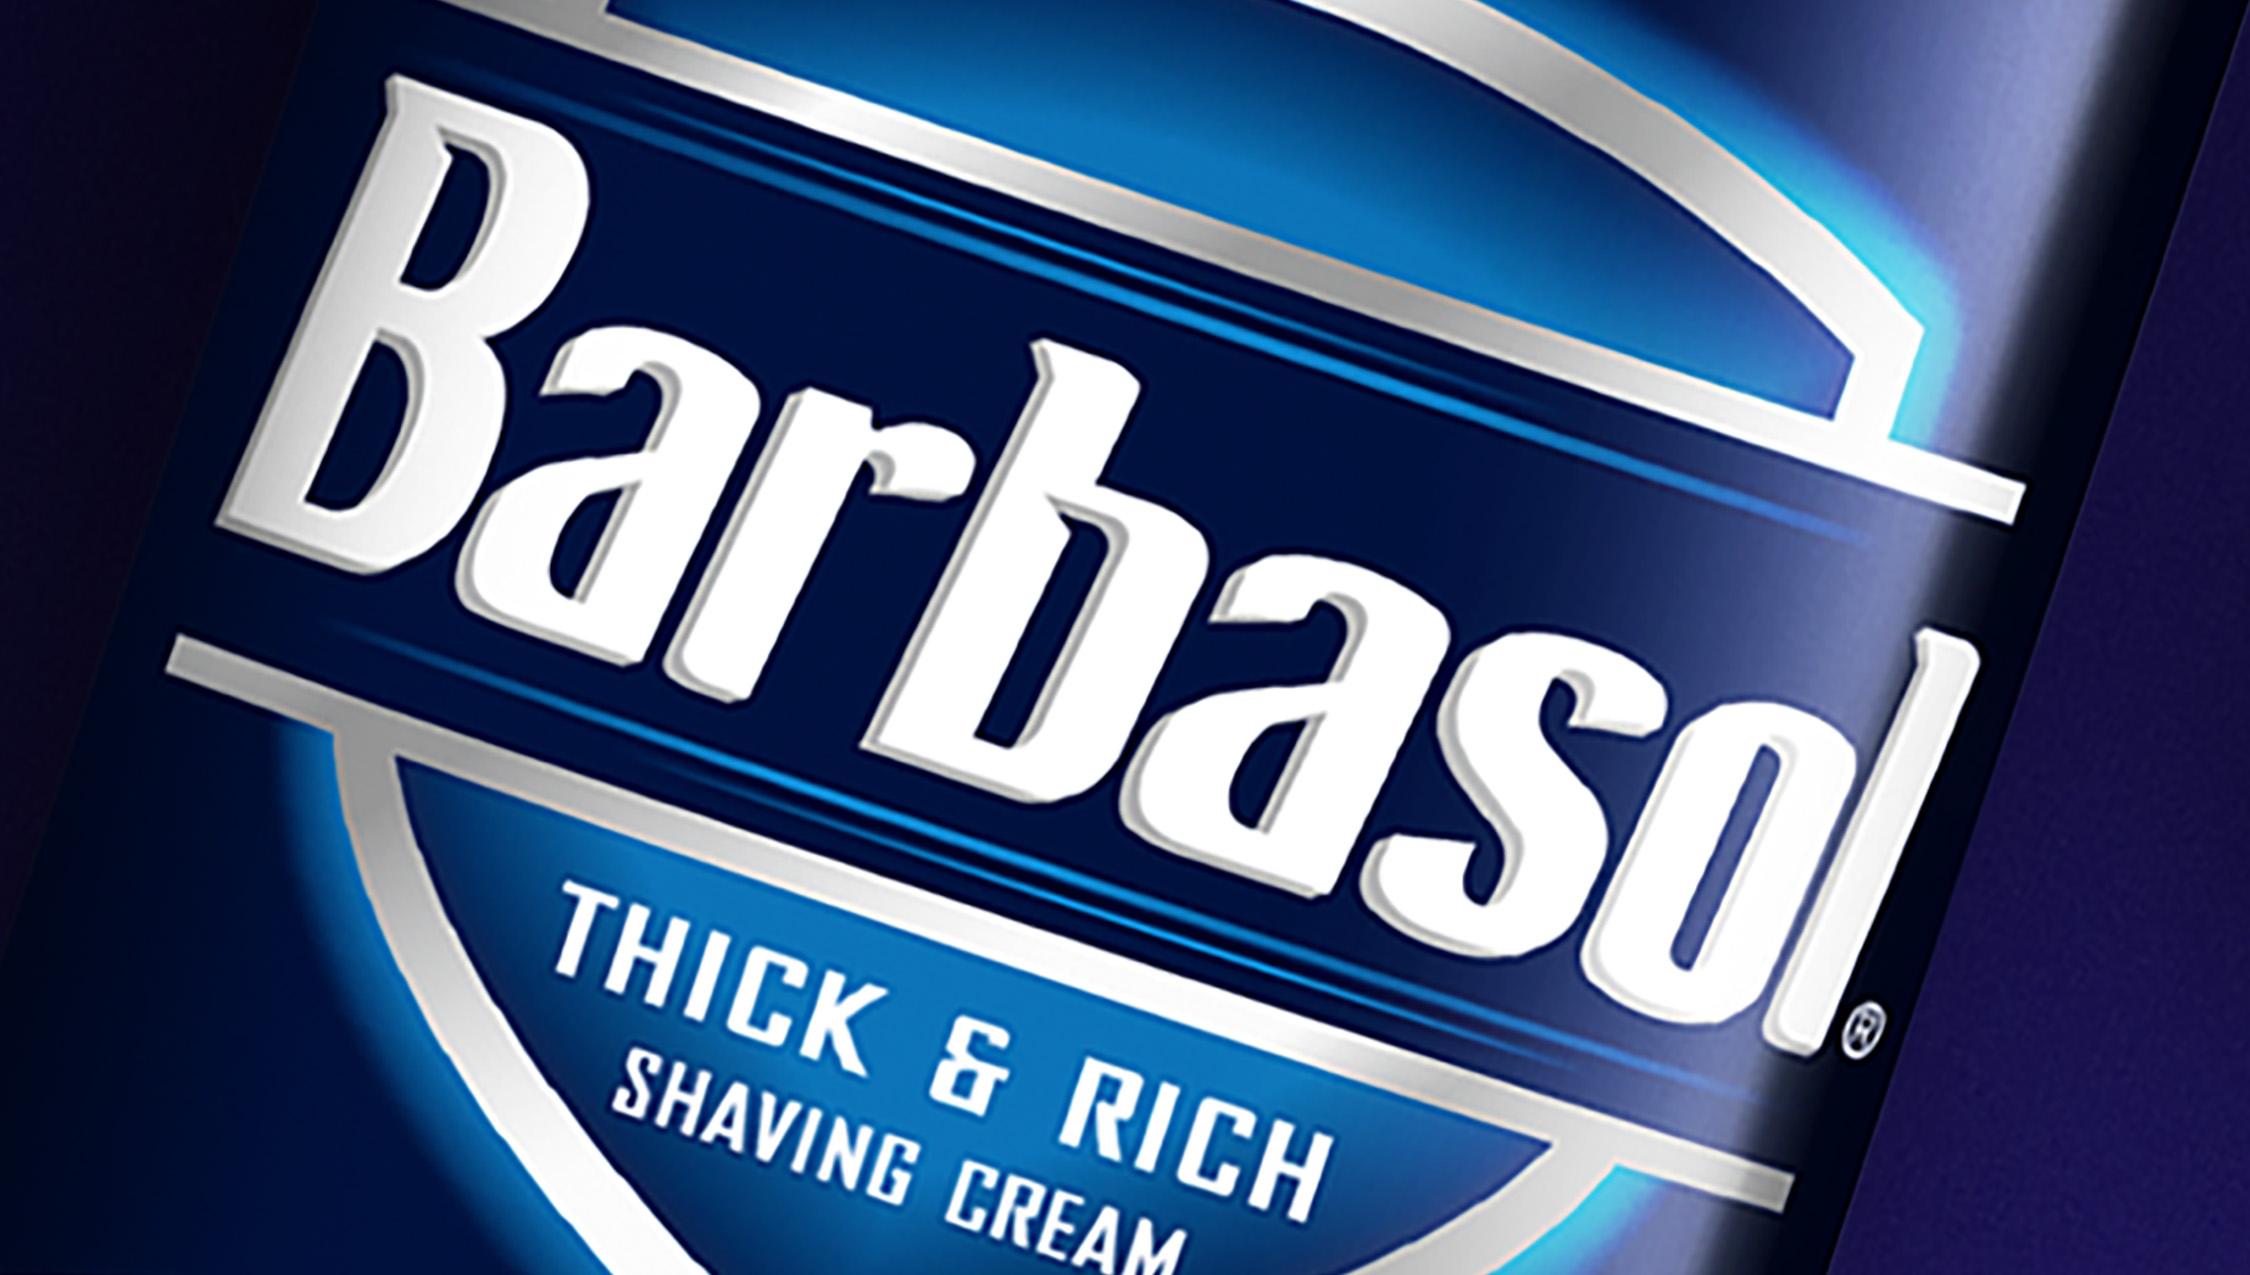 Barbasol_Crop.jpg